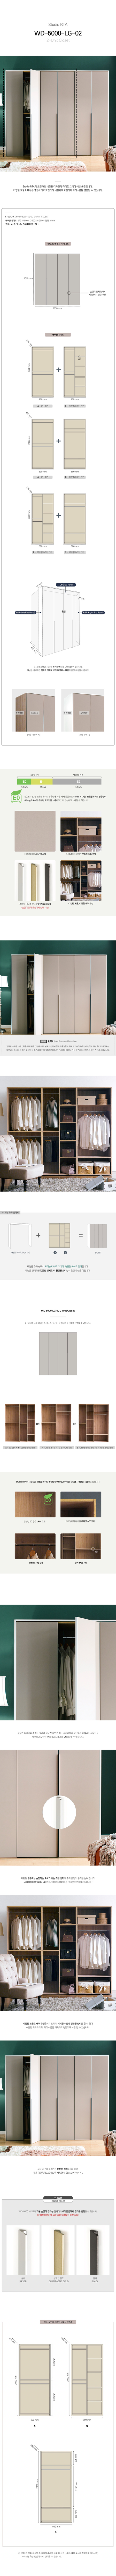 WD-5000-LG-2-Unit_Closet_181207.jpg